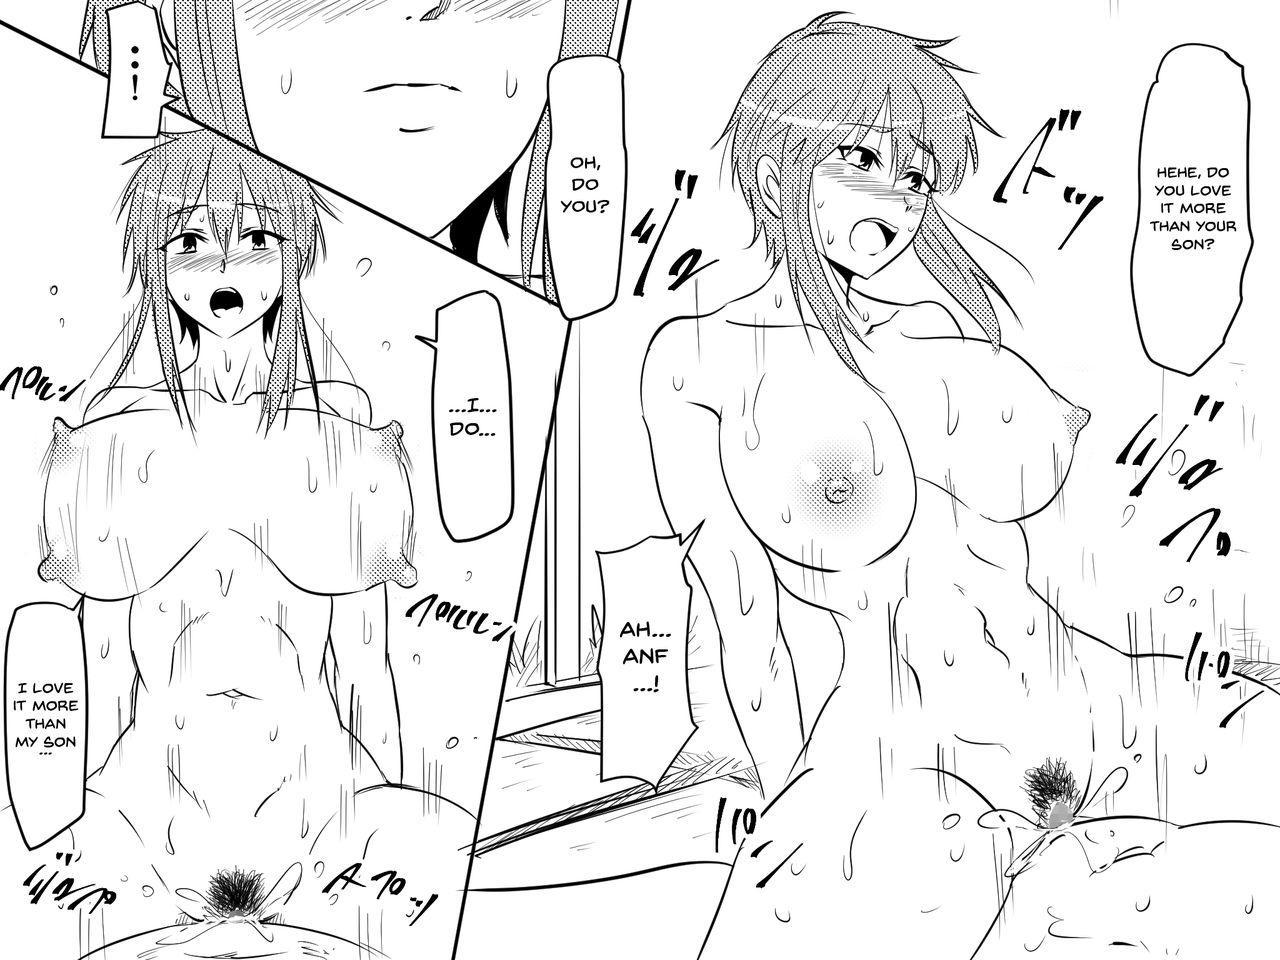 [Mikezoutei] Netorare Haha ~Kachiki de Kimottama no Okaa-san ga Boku o Ijimeru Aitsu no Onna ni Naru Hanashi~   Mom NTR ~A Story Of How My Gutsy Mom Ended Up Becoming My Bully's Plaything~ [English] {Doujins.com} 63